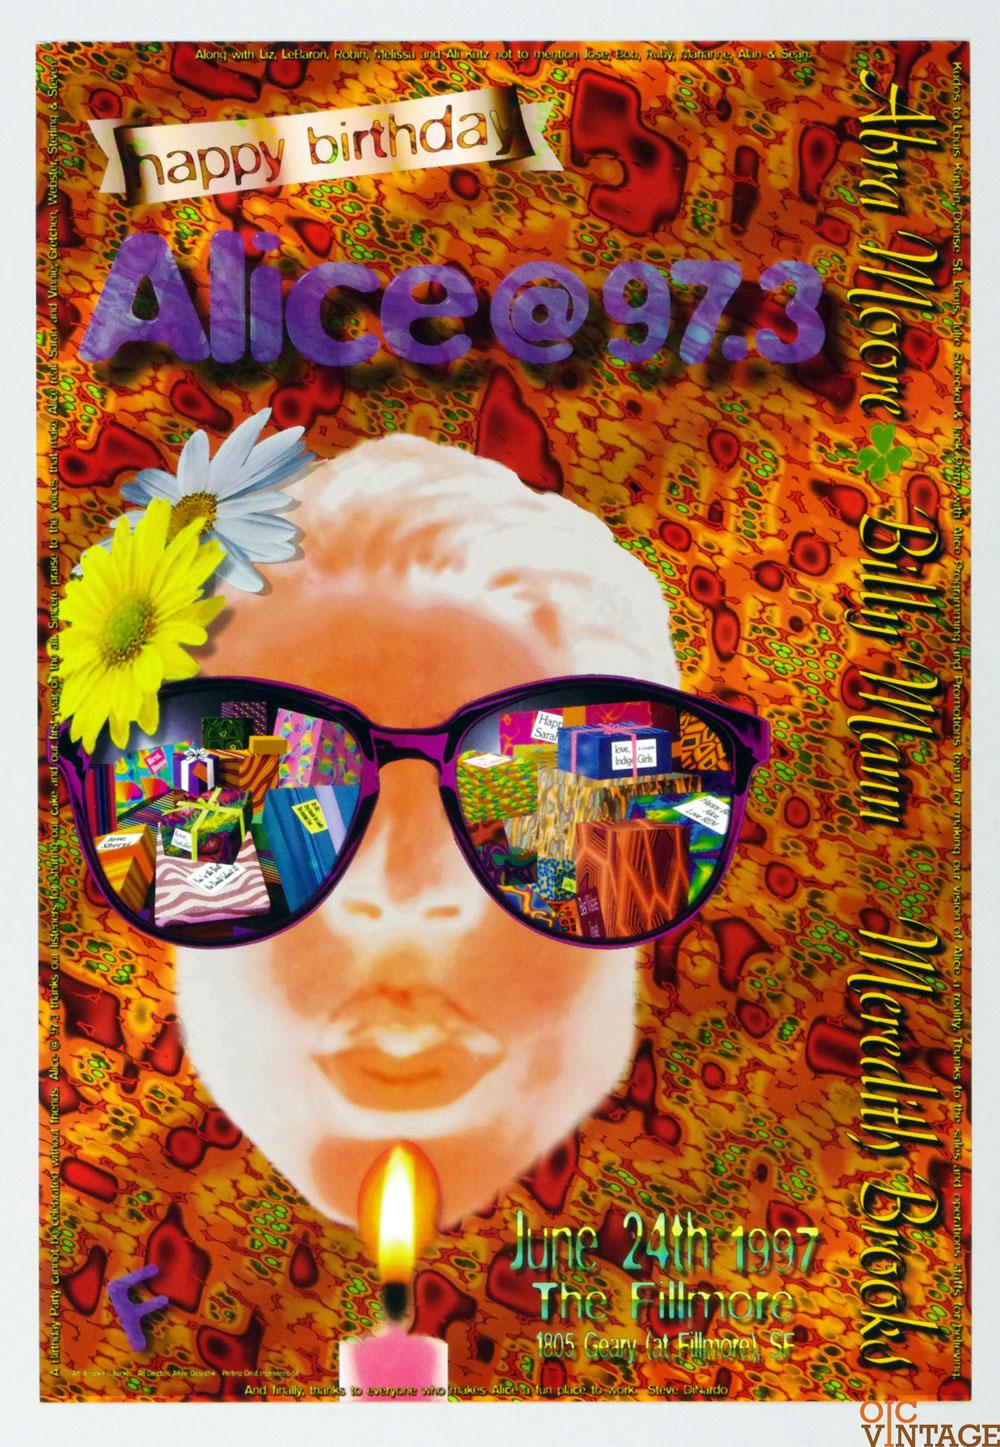 Abra Moore Meredith Brooks Poster 1997 Jun 24 New Fillmore San Francisco